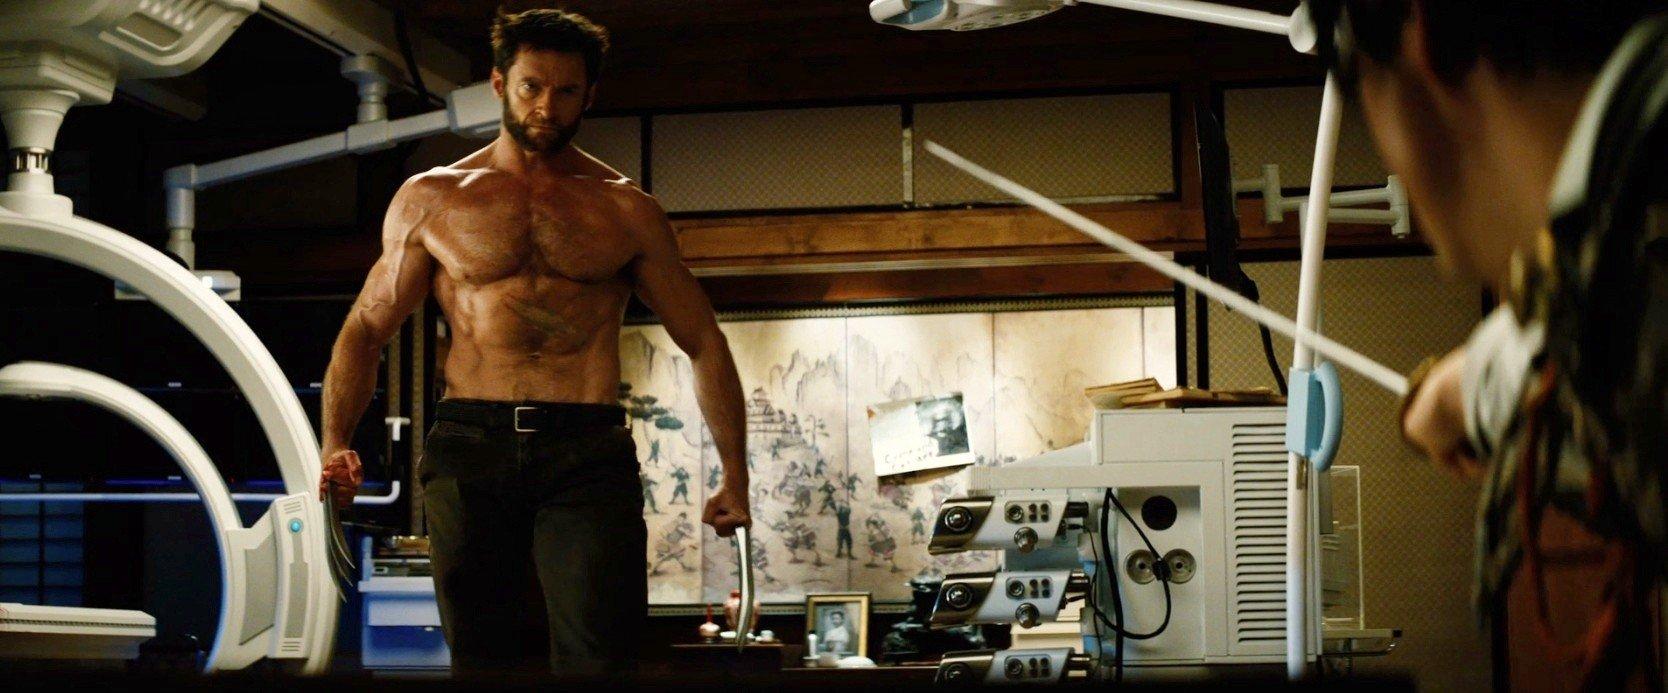 The Wolverine 2013: The Wolverine - DC FilmdomDC Filmdom